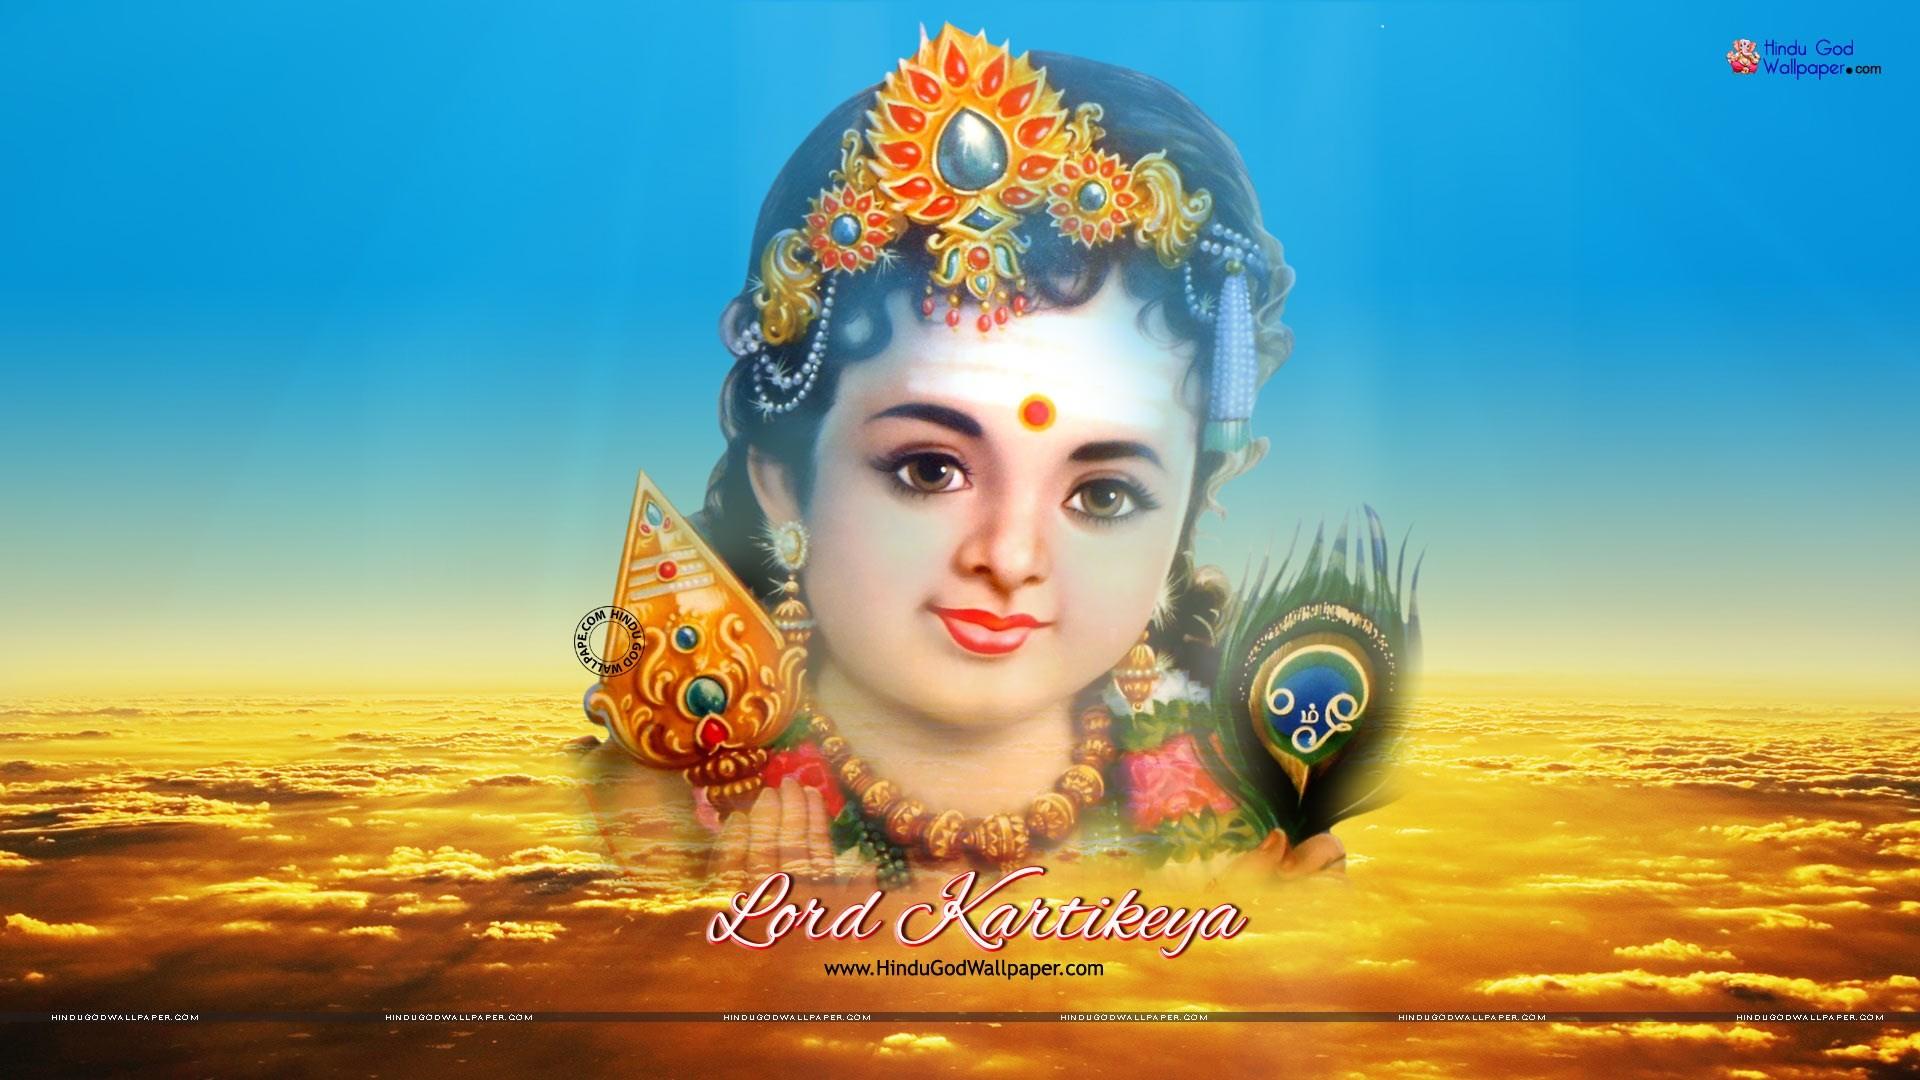 hindu god hd wallpapers 1080p 68 images mobile legend hd wallpaper mobile legend hd wallpaper